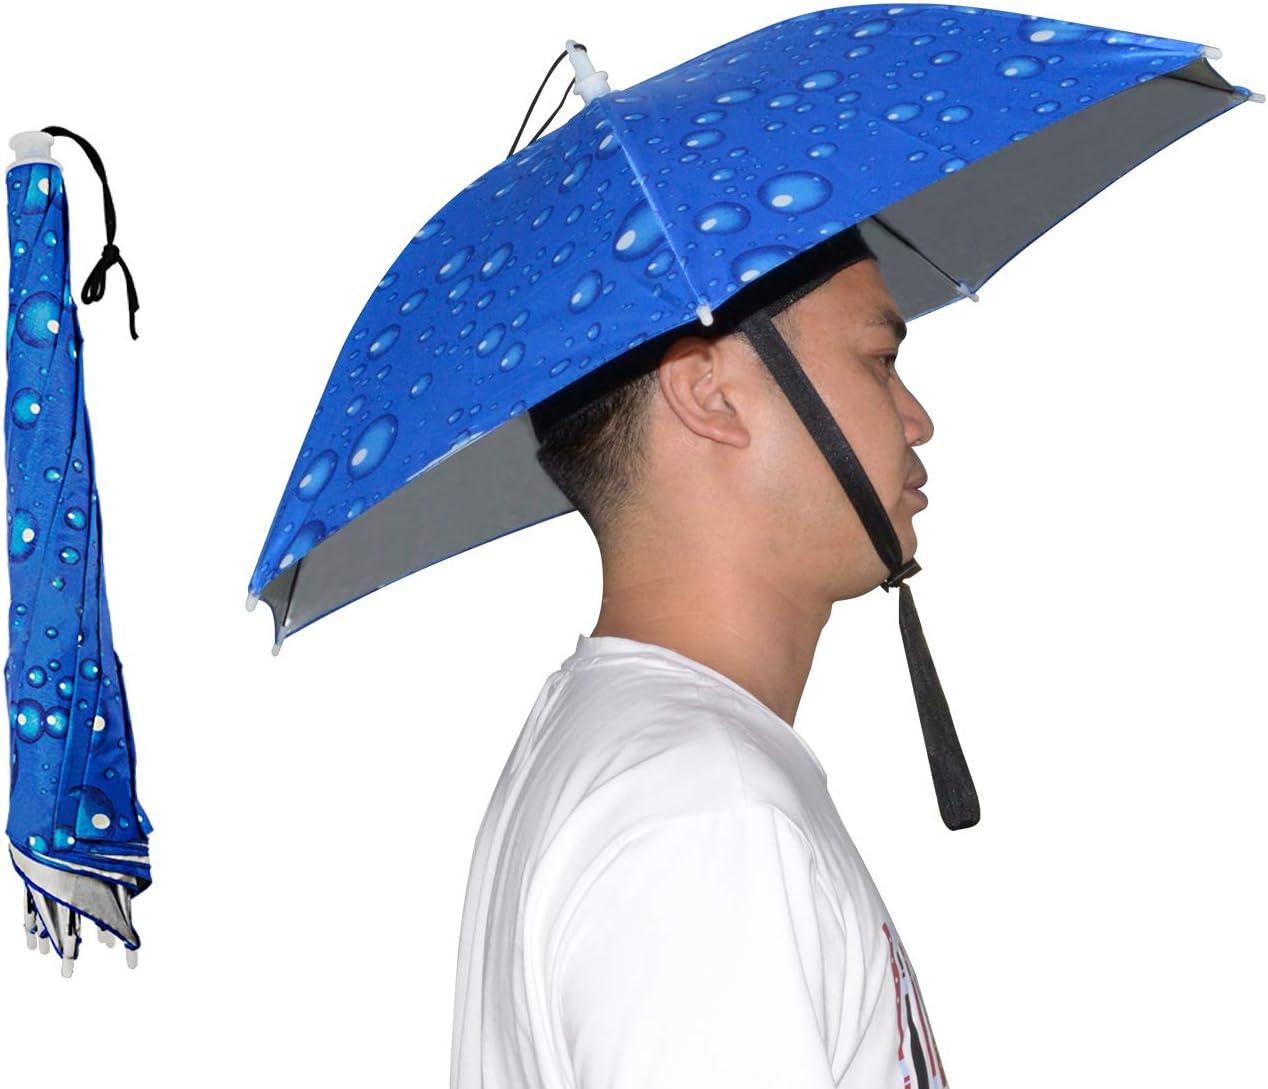 NEW-Vi Umbrella Hat Adult and Kids Folding Cap for Beach Fishing Golf Party Headwear (Blue 2 Pcs)